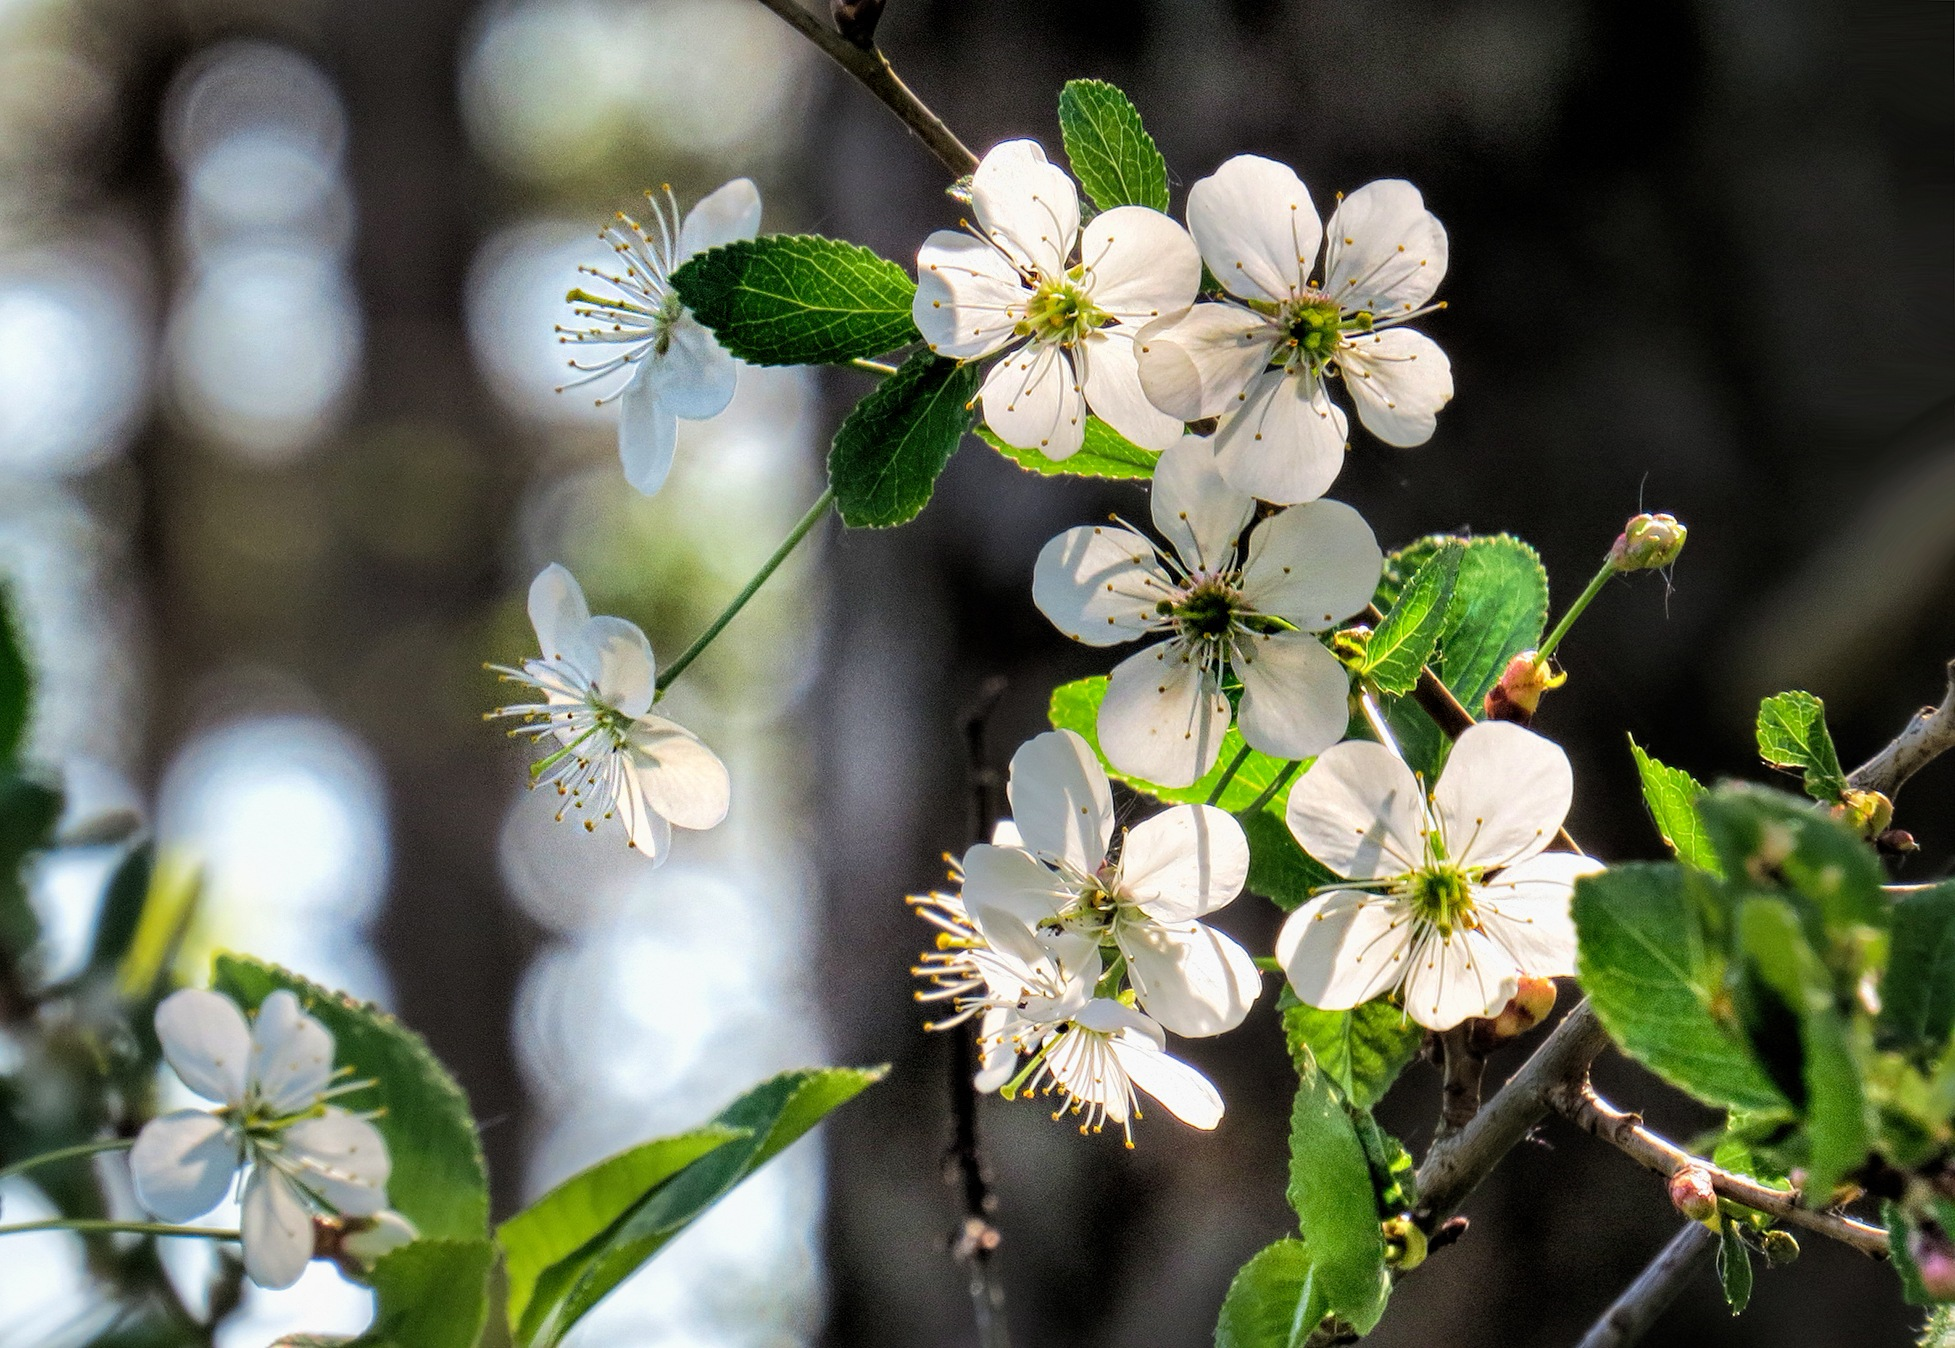 Bird-cherry Tree by susanne.m.andersson.92